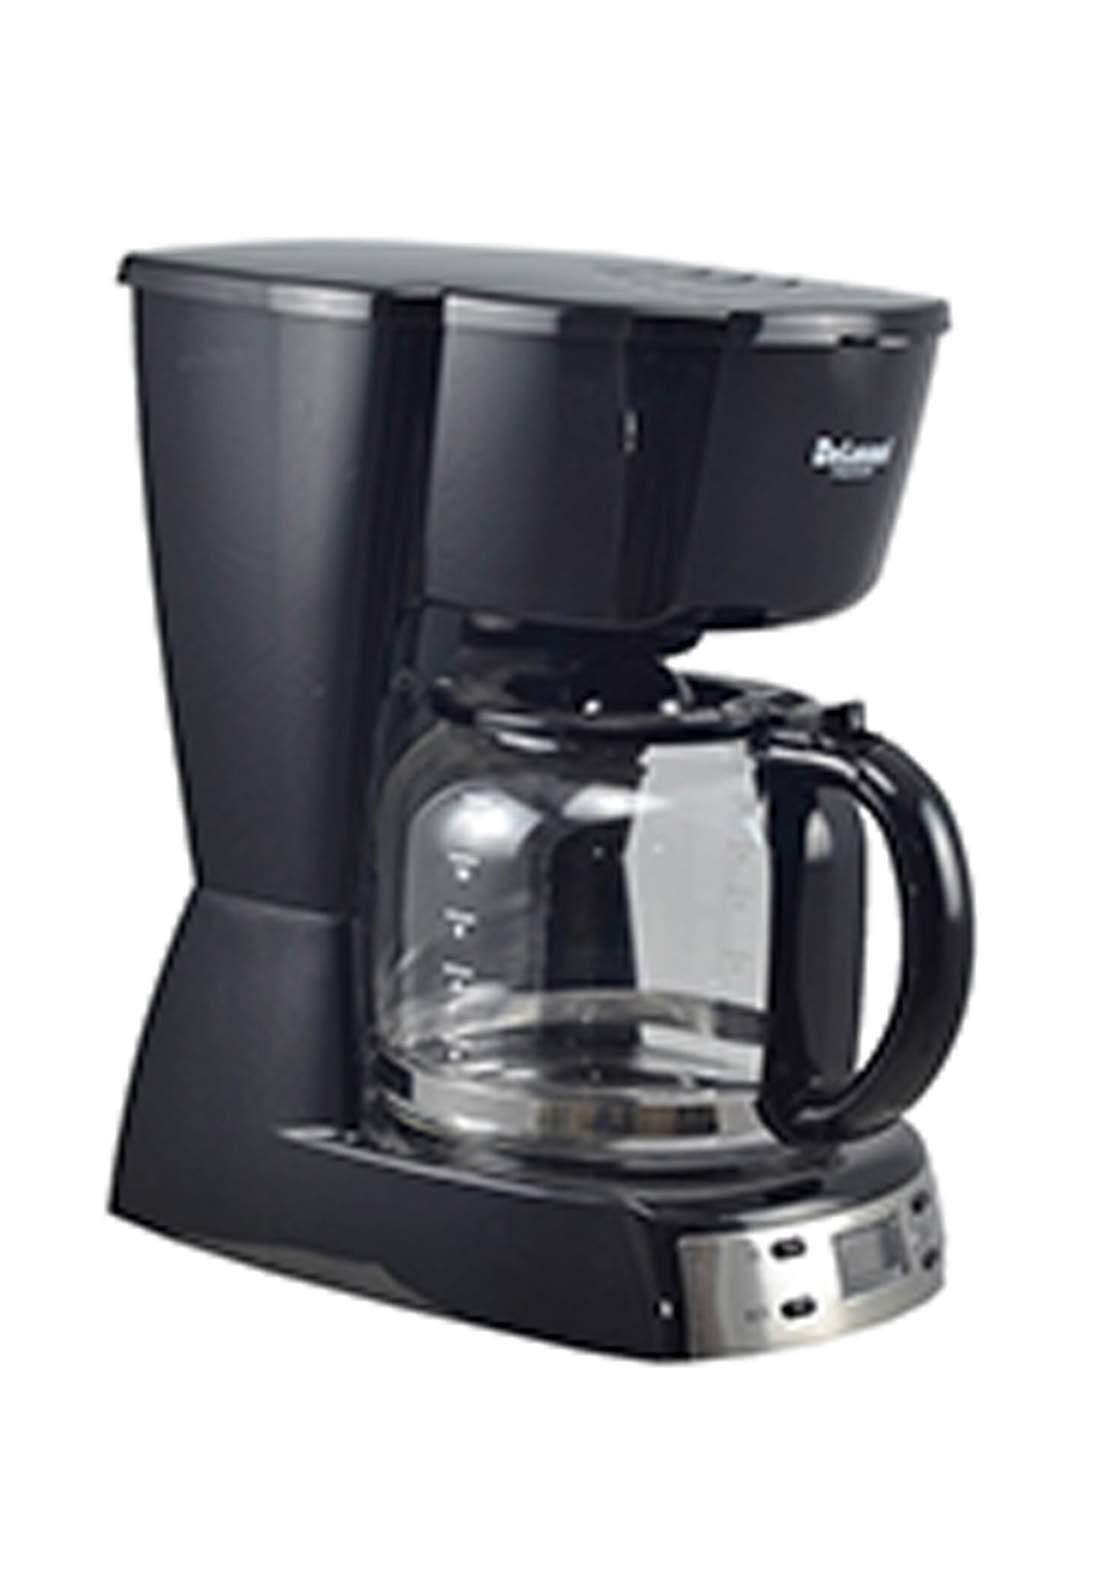 Delmonti  DL 655 Digital coffee maker  ماكنة صنع قهوة